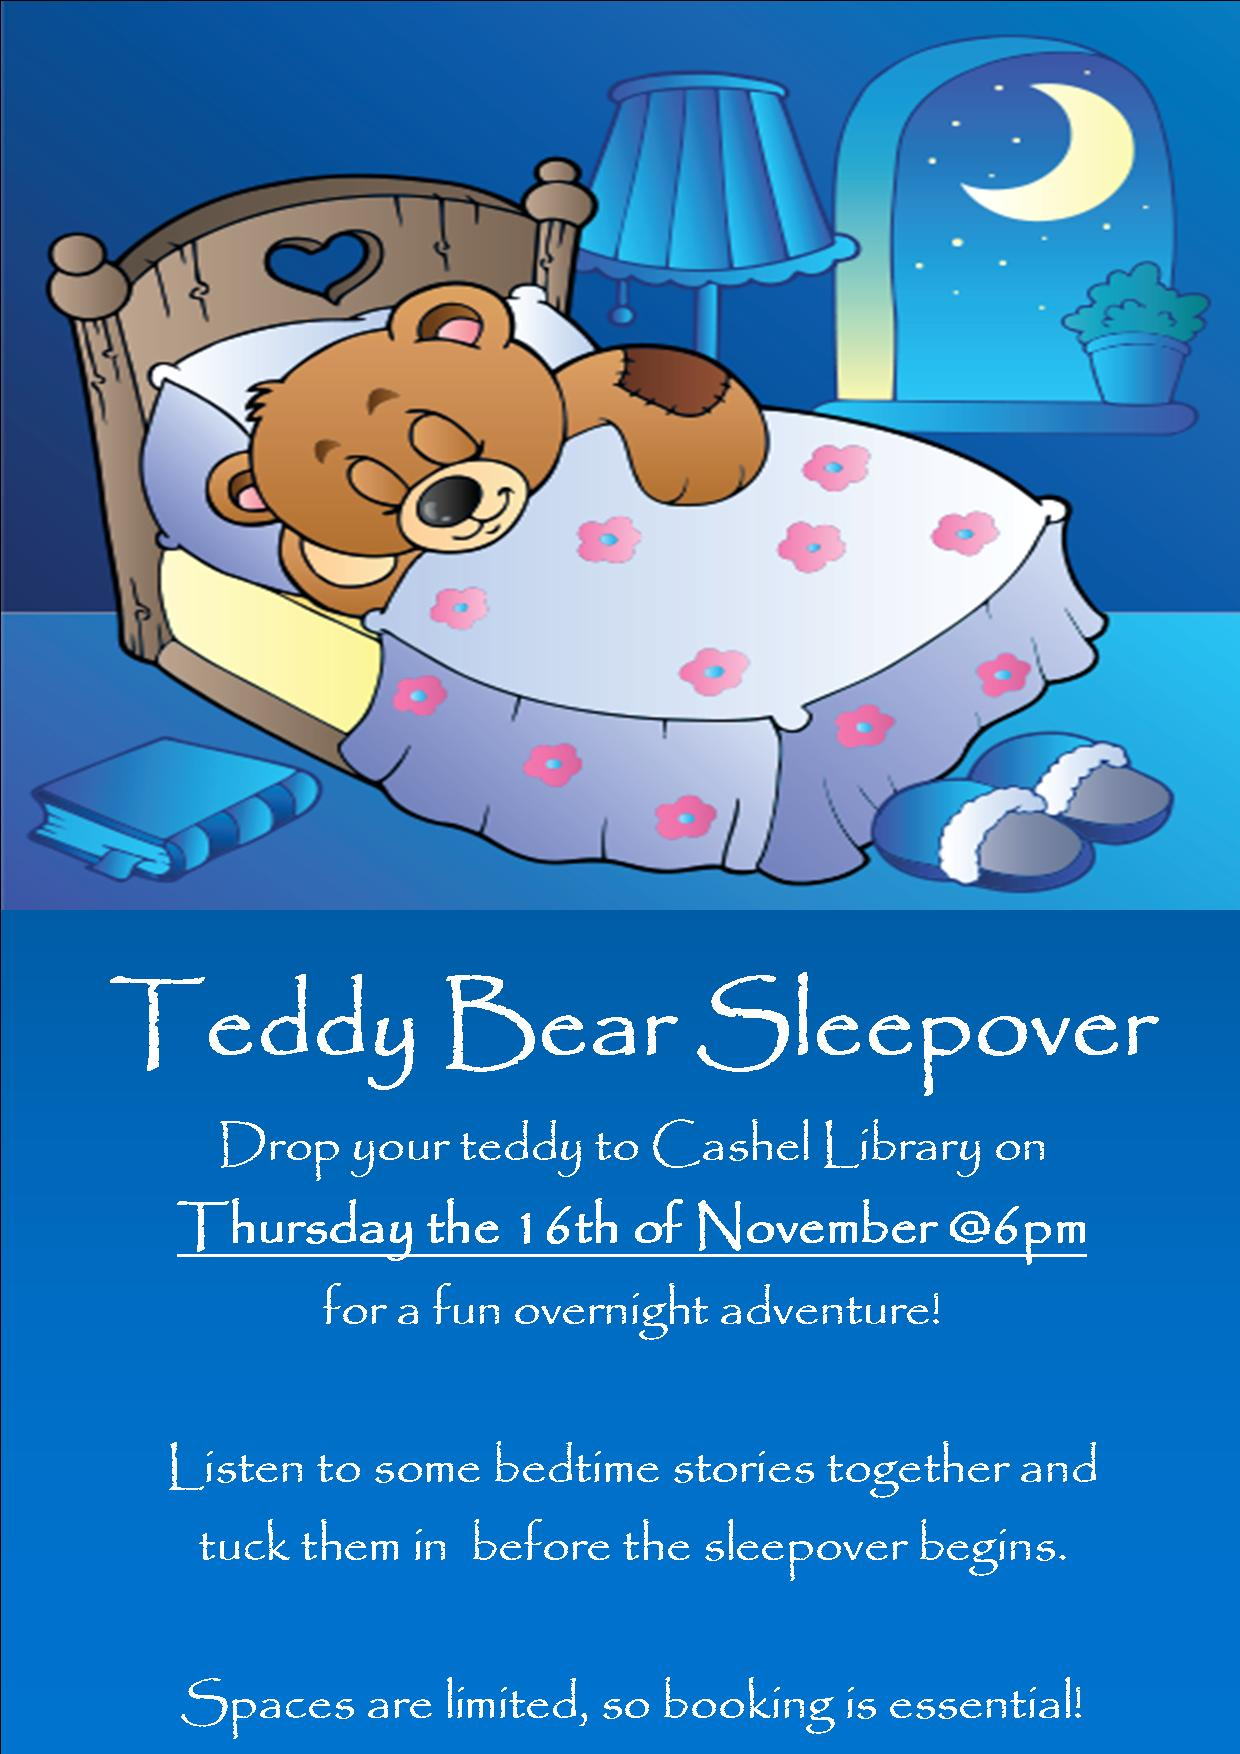 Teddy Bear Sleepover In Cashel Library